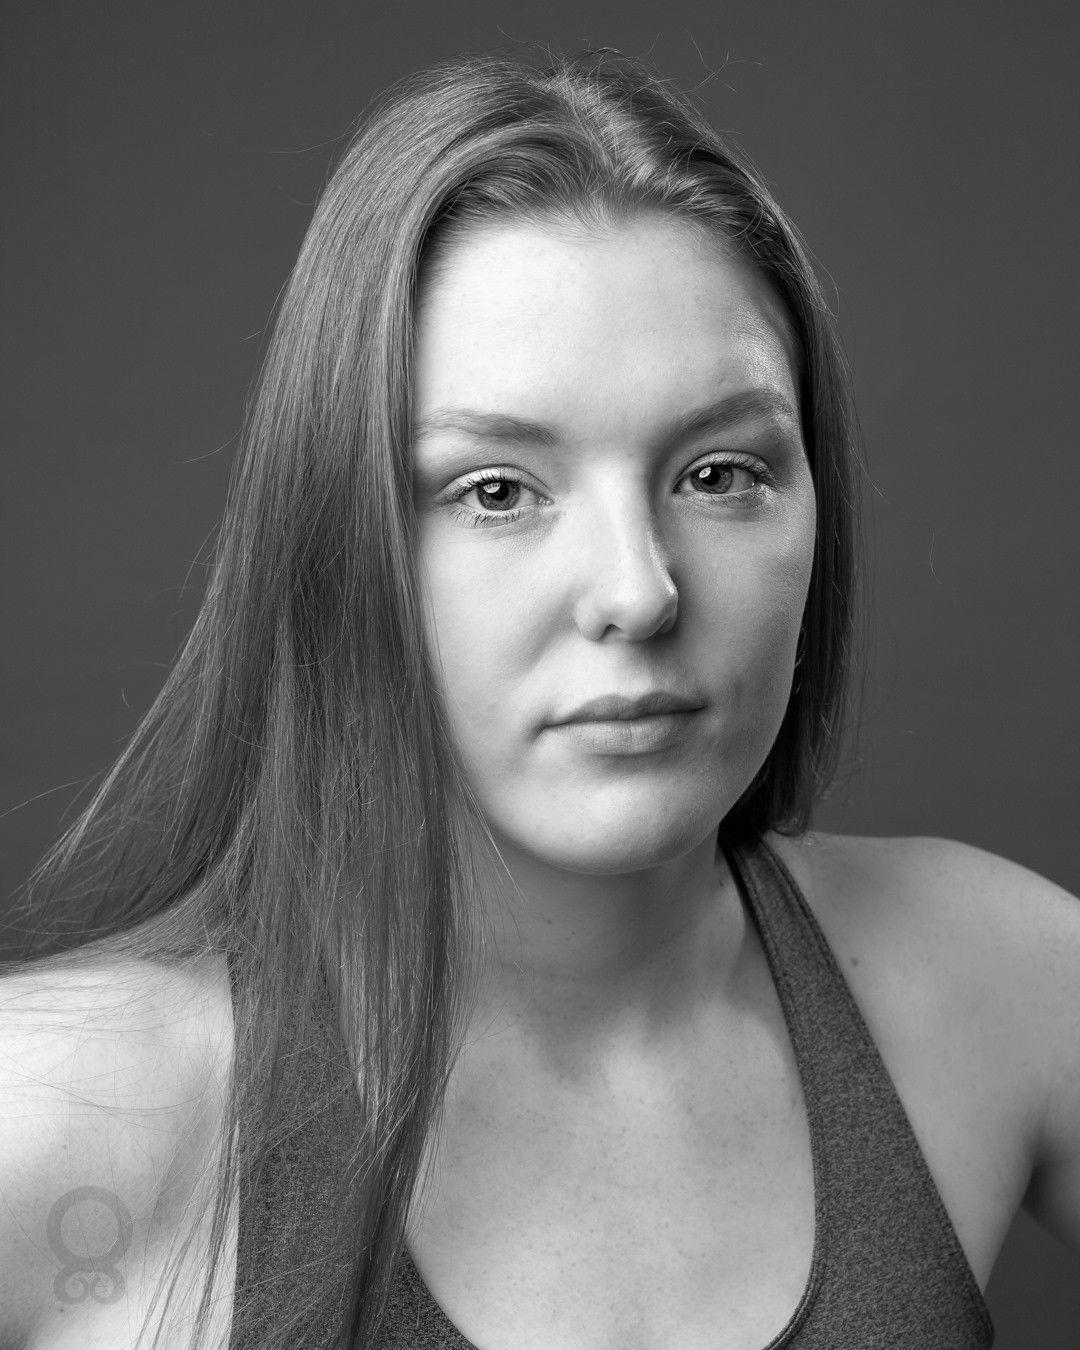 studio portrait of Jasmine #foyersphotography #suffolkphotographer #bentwaters #bentwaterspark #commercialphotographersuffolk #fitnessmodel #ipswich #modelsuffolk #personalbranding #personalbrandingsuffolk #photographersuffolk #photoshoot #portrait #portraitamazing #portraitmodel #portraitphotographersuffolk #studiosuffolk #suffolkmodel #suffolkstudio #woodbidge #headshot #headshotphotographysuffolk #saxmundham #aldeburgh #suffolkportraitphotographer #suffolkportraitphotography #portraitphotogra